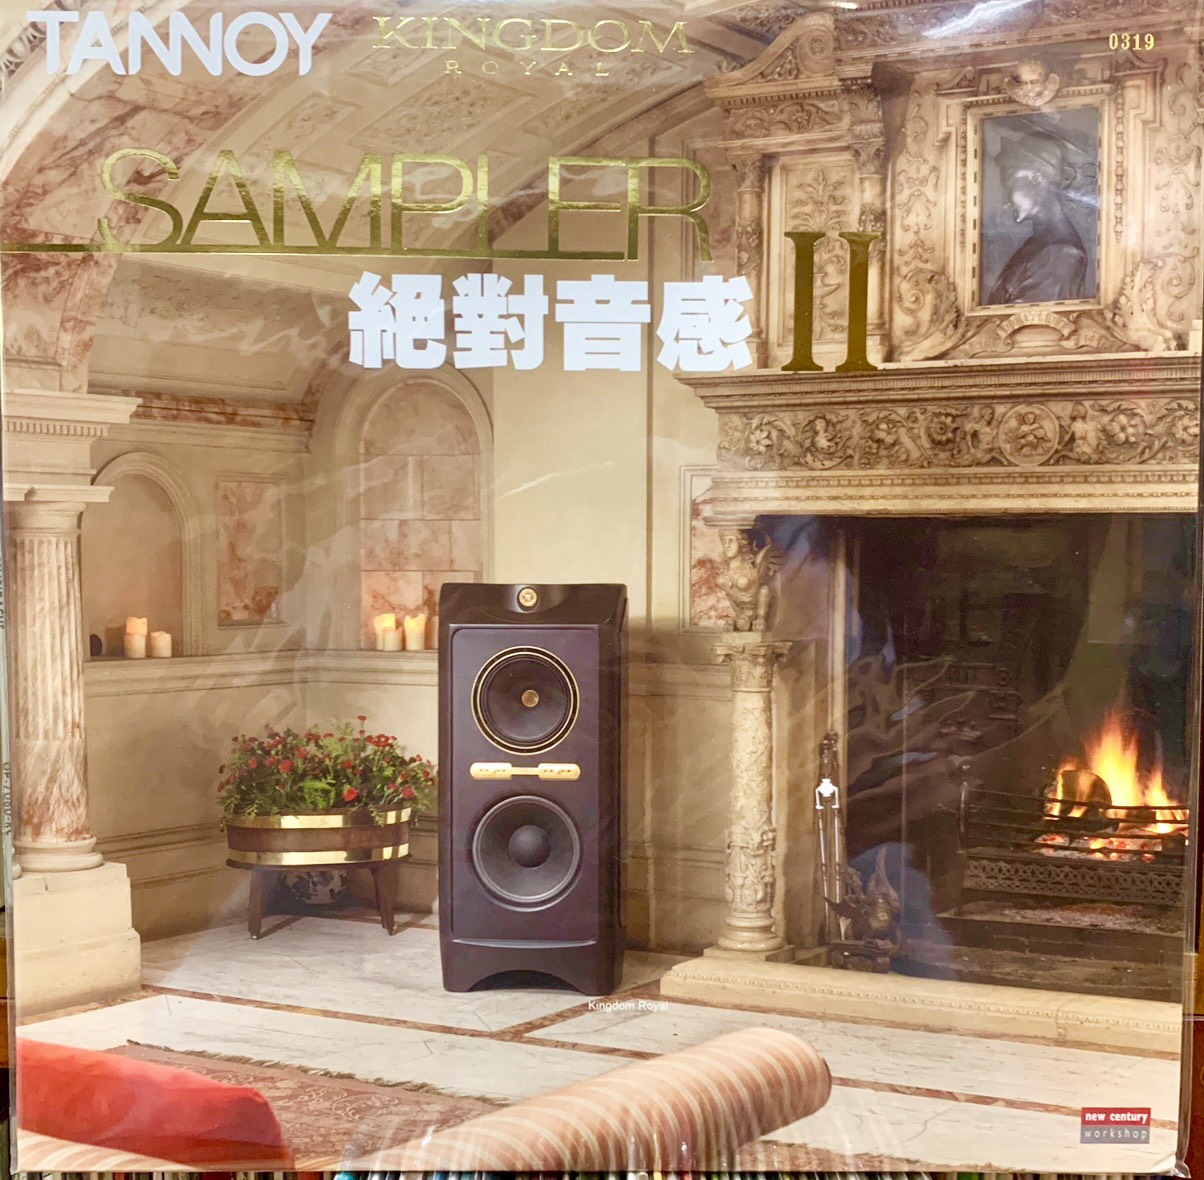 dia-than-lp-tannoy-sampler-2